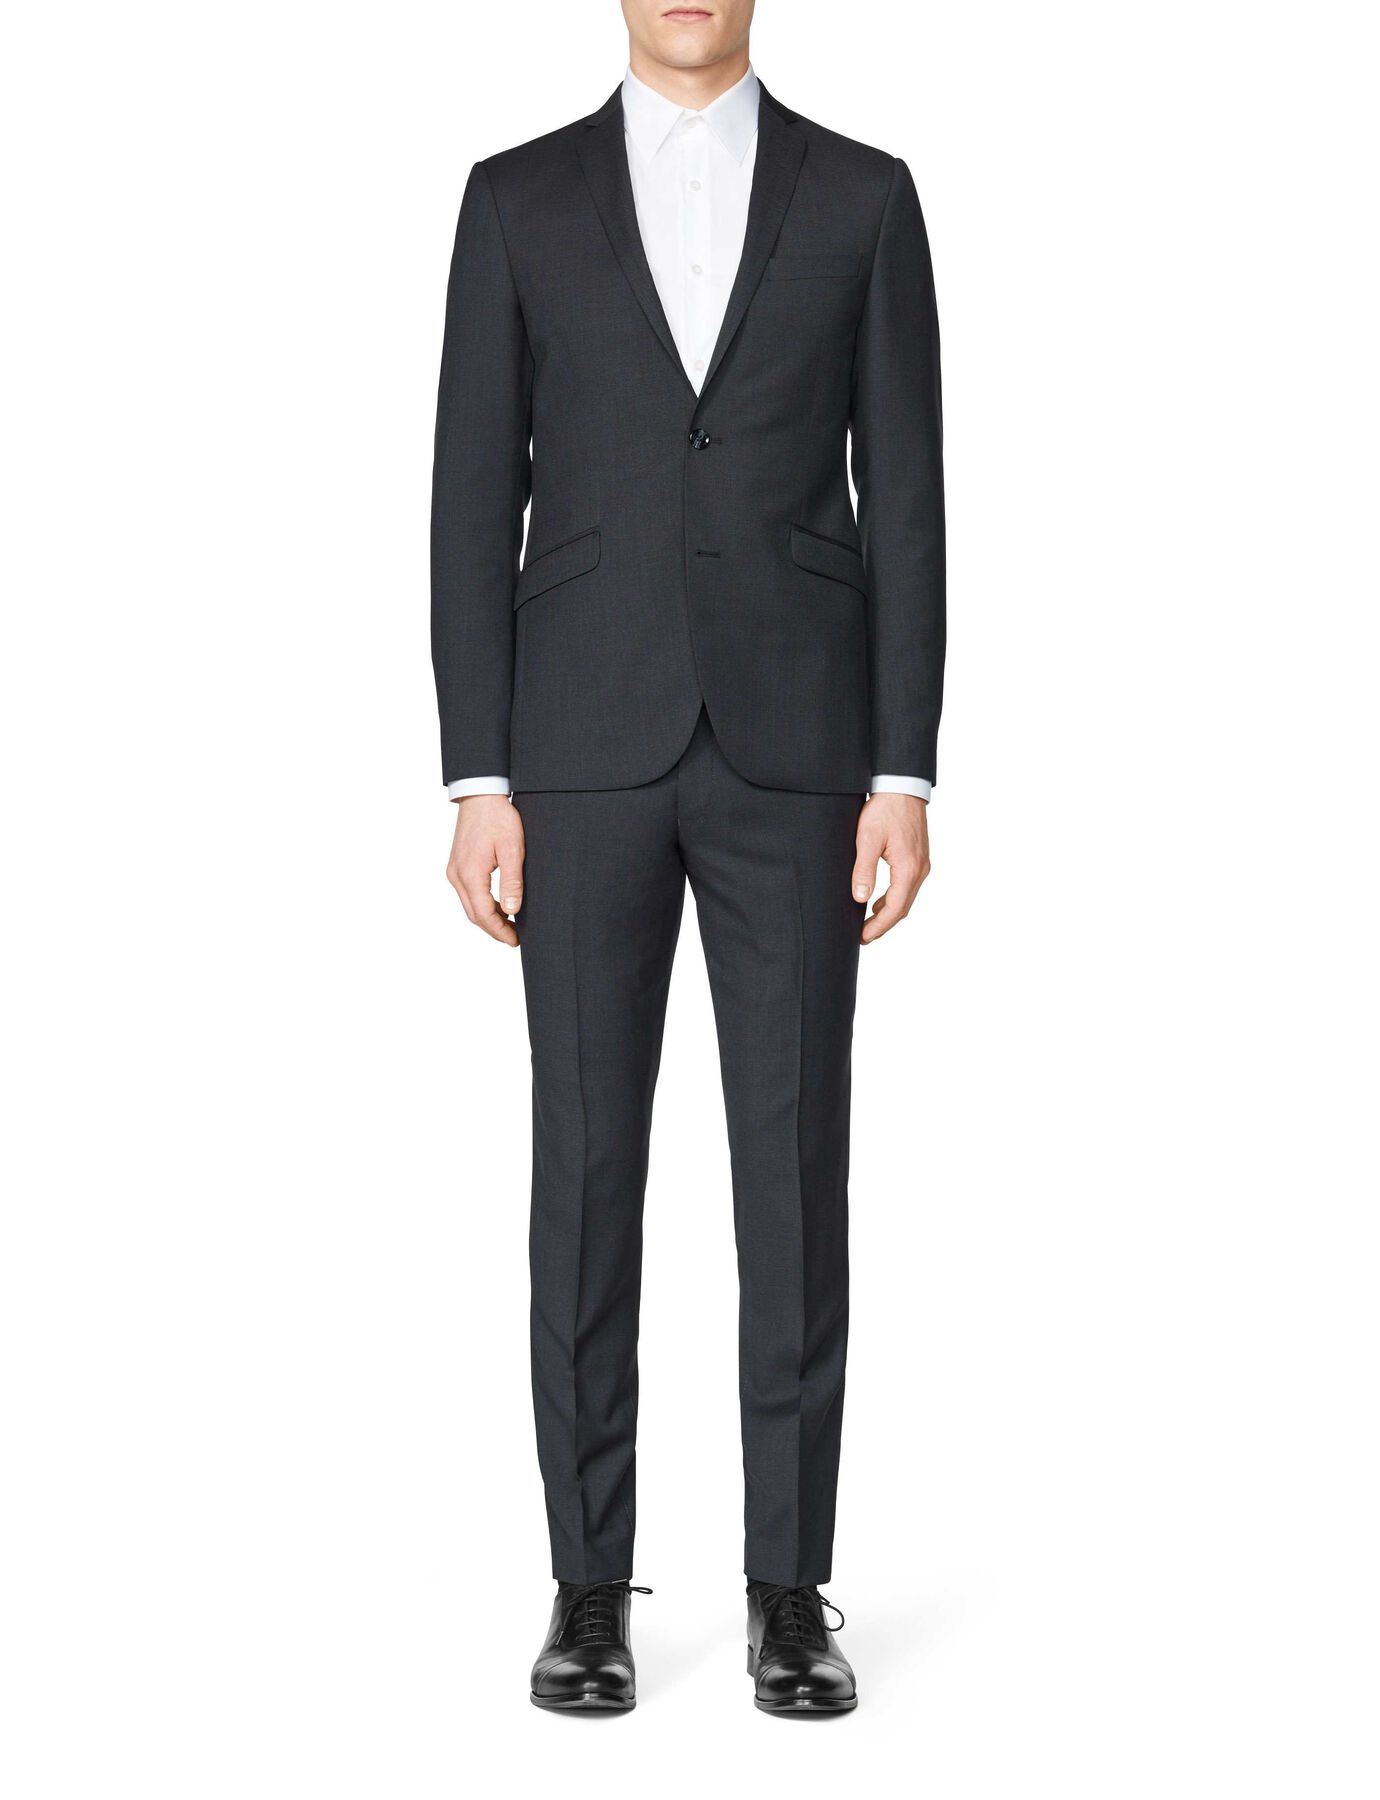 Main trousers